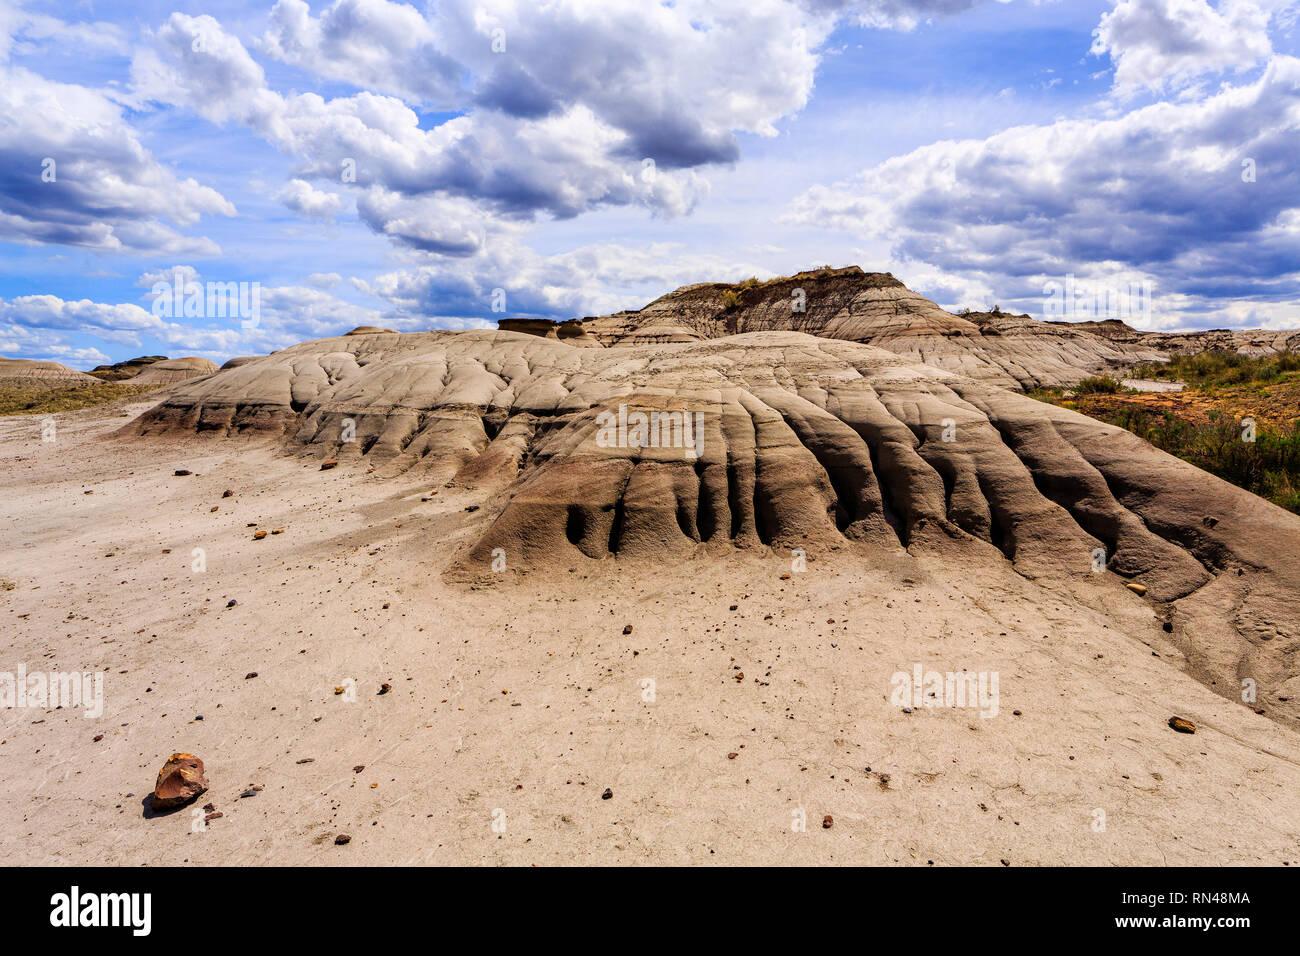 Badlands of Dinosaur Provincial Park, Alberta, Canada. - Stock Image